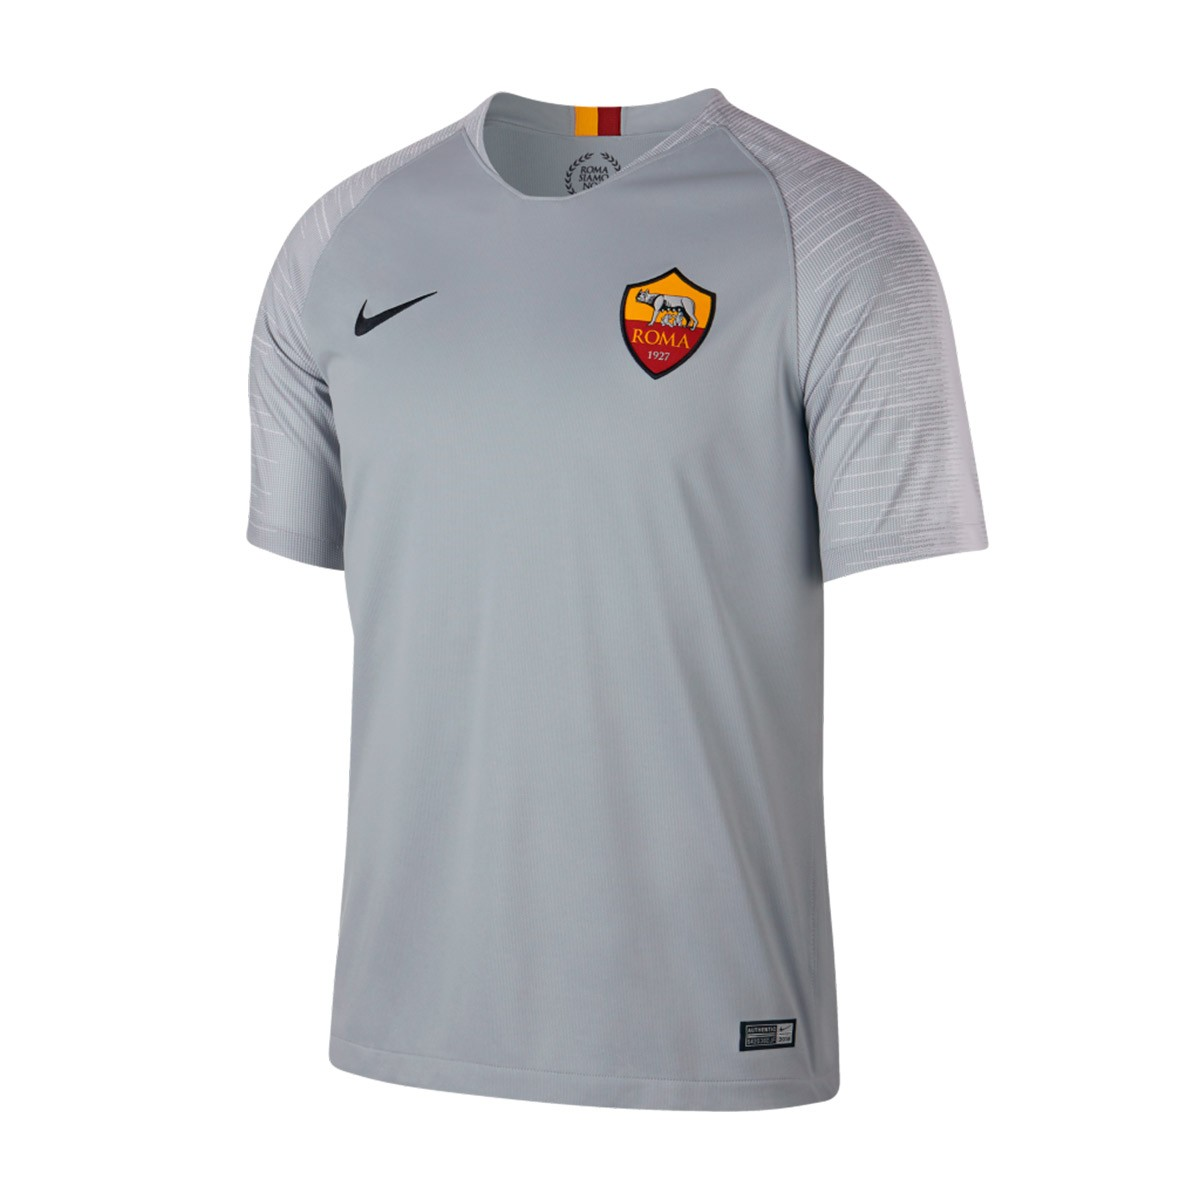 equipacion ROMA futbol